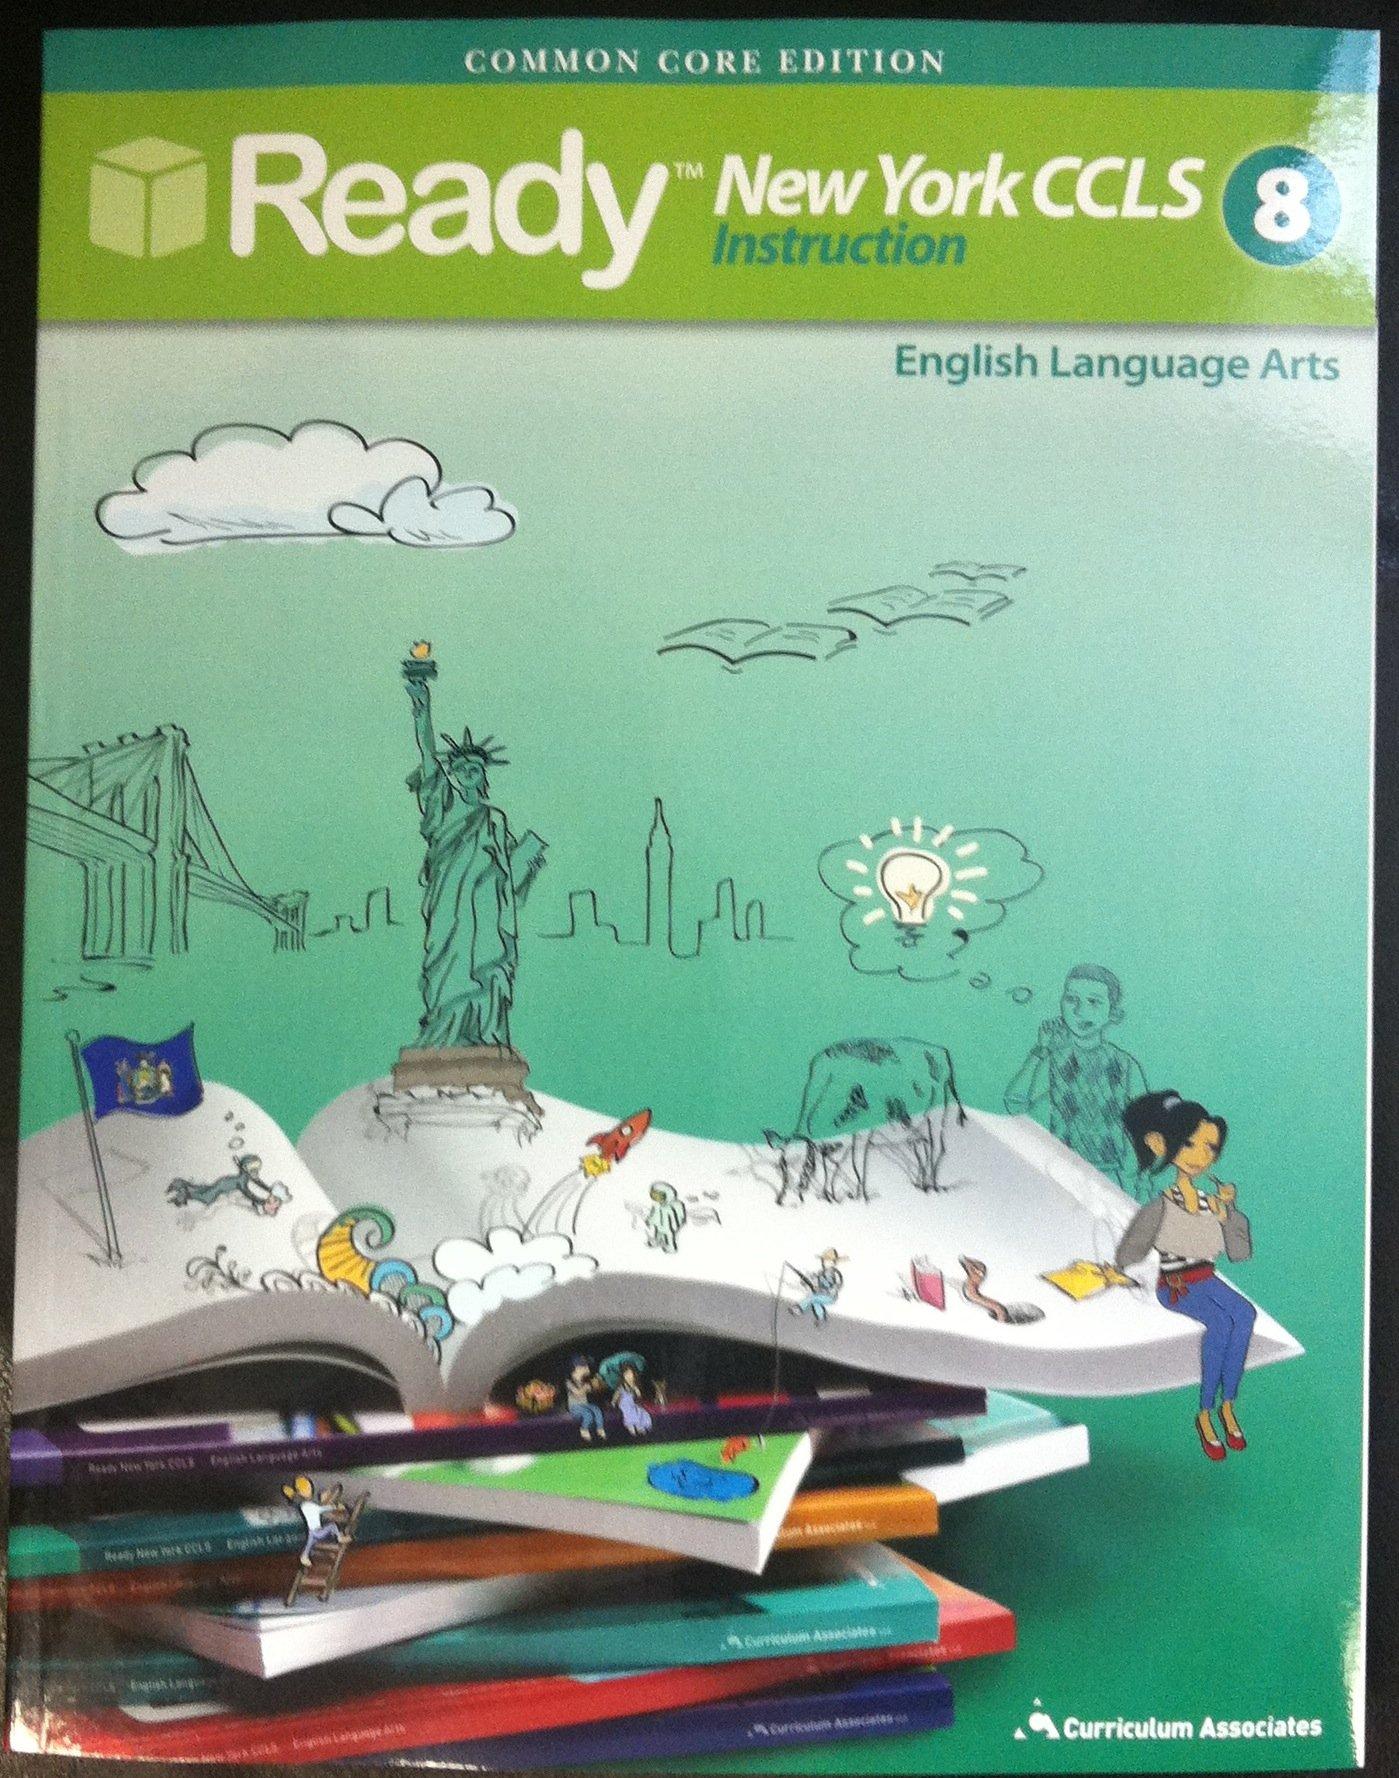 Download New York Common Core Grade 8 ELA Student Instruction Book pdf